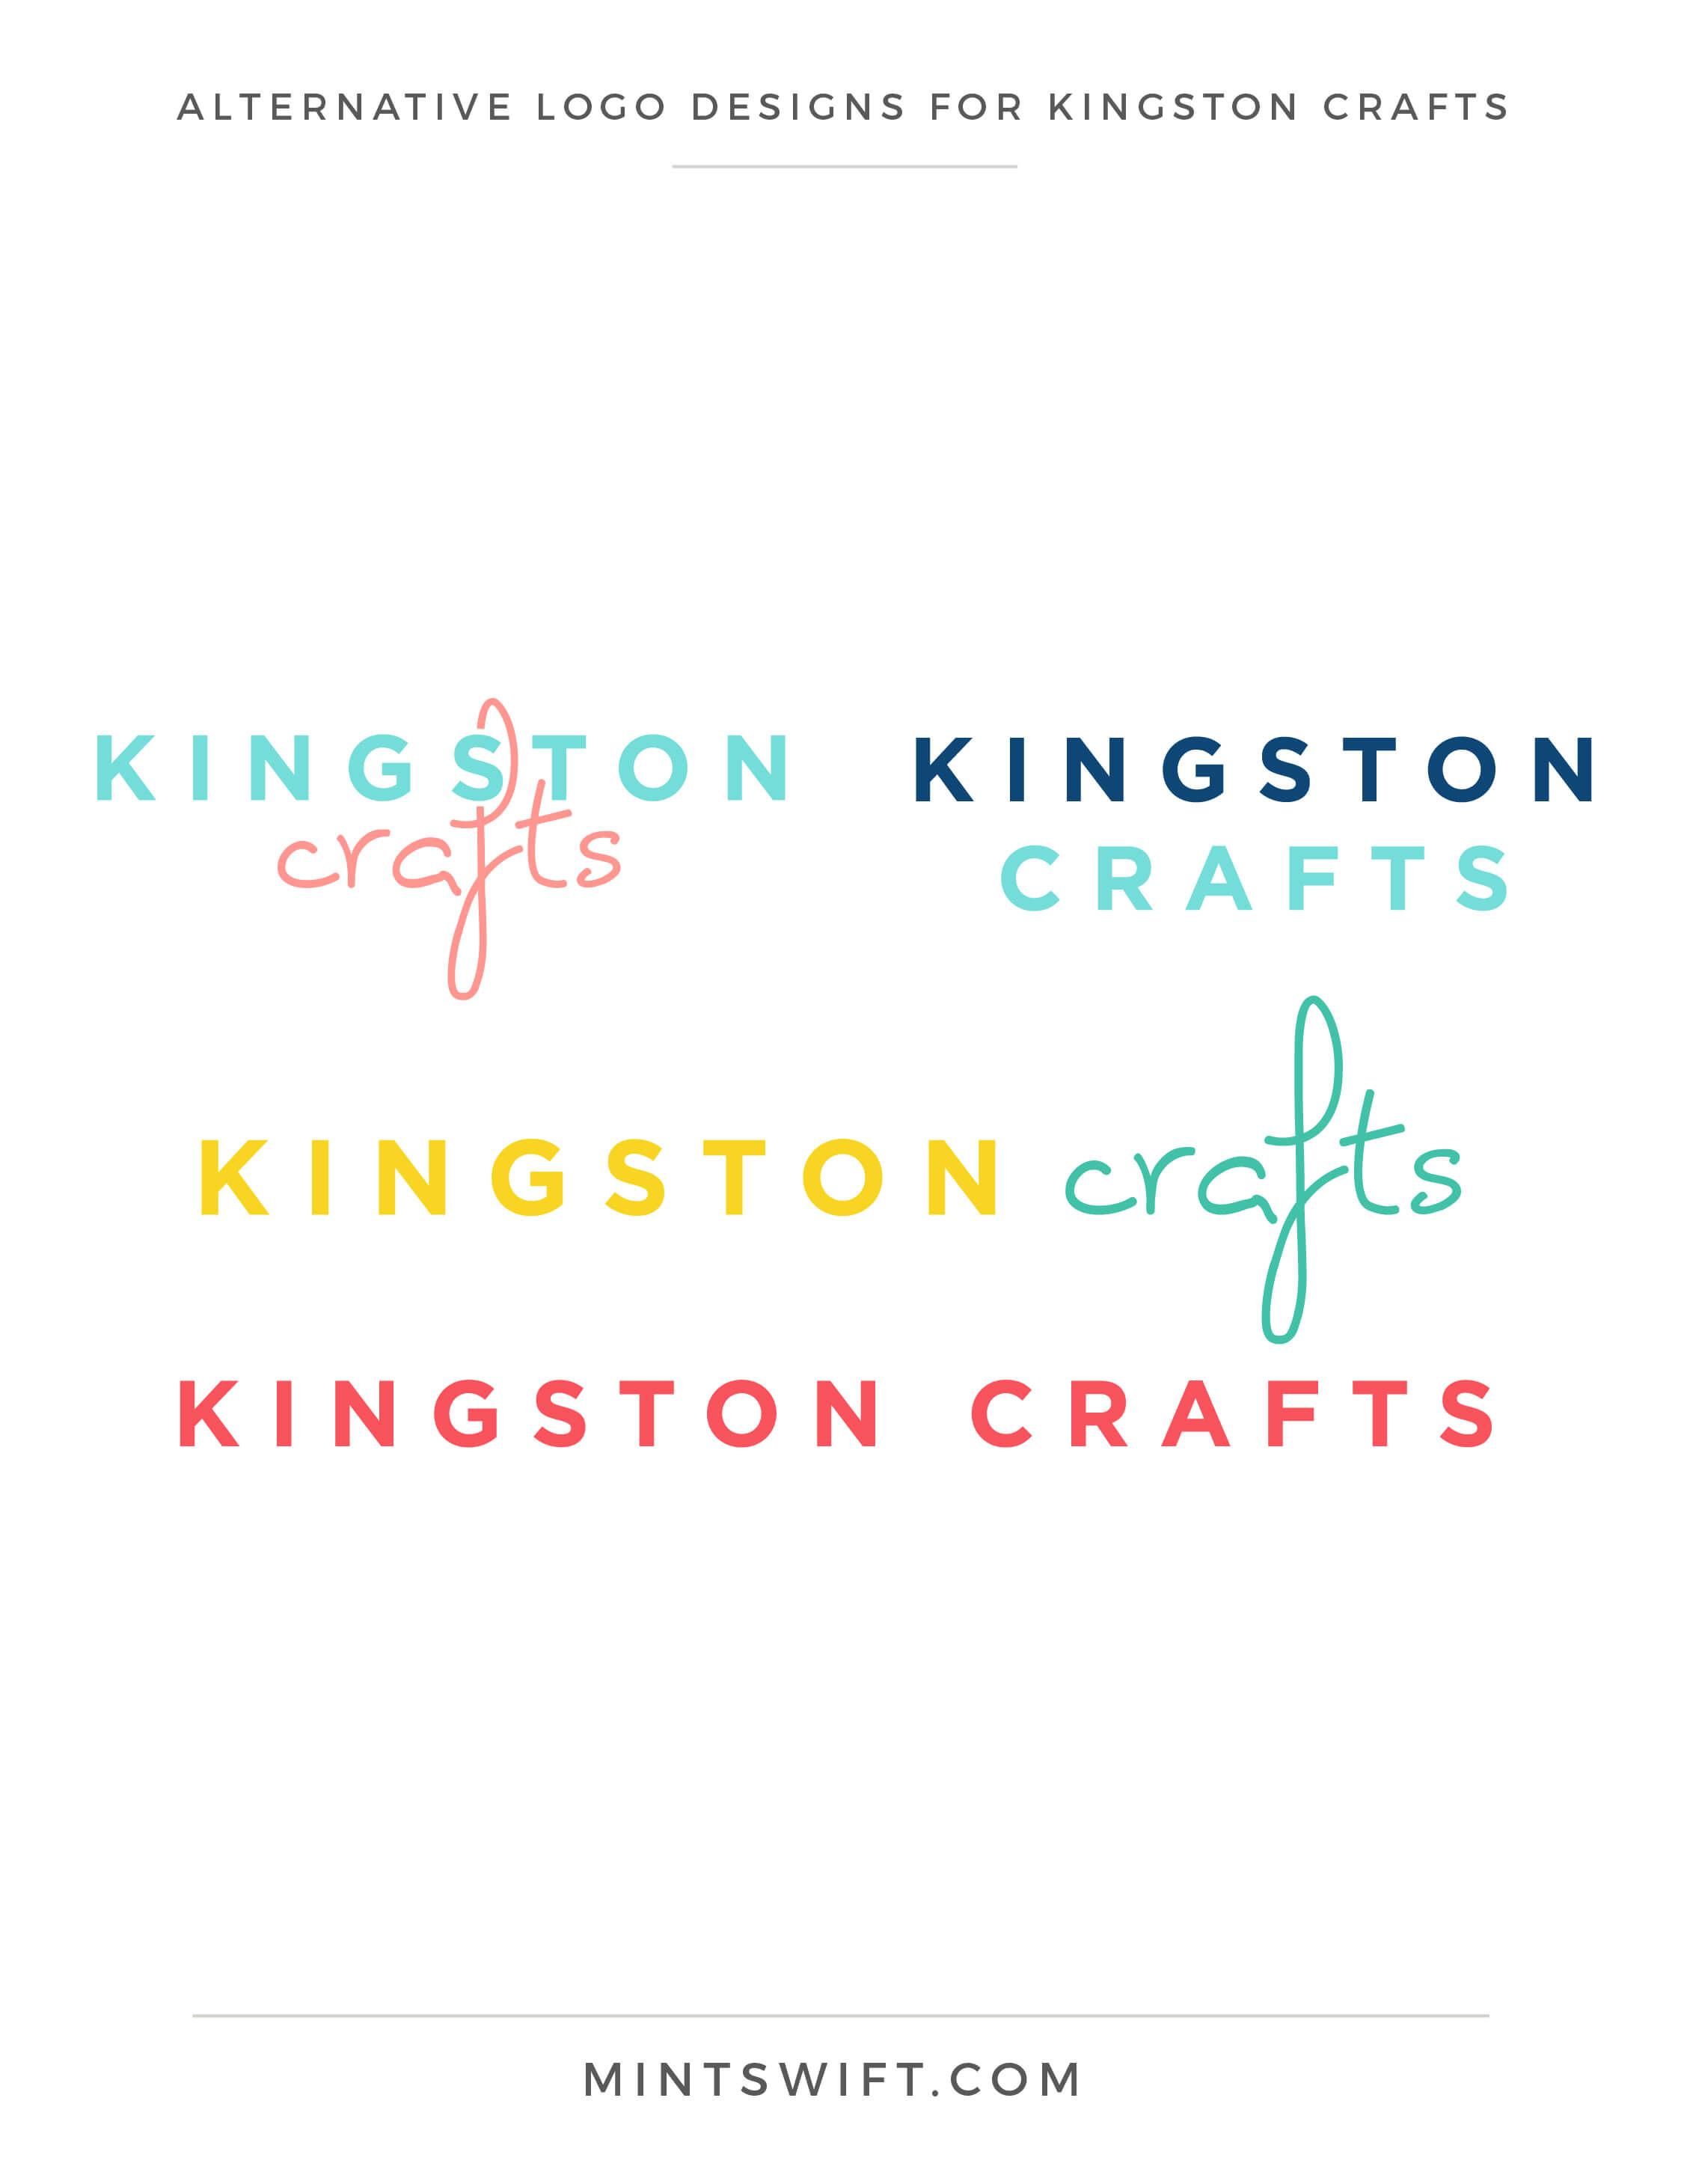 Kingston Crafts - Alternative Logo Designs - Brand Design Package - MintSwift